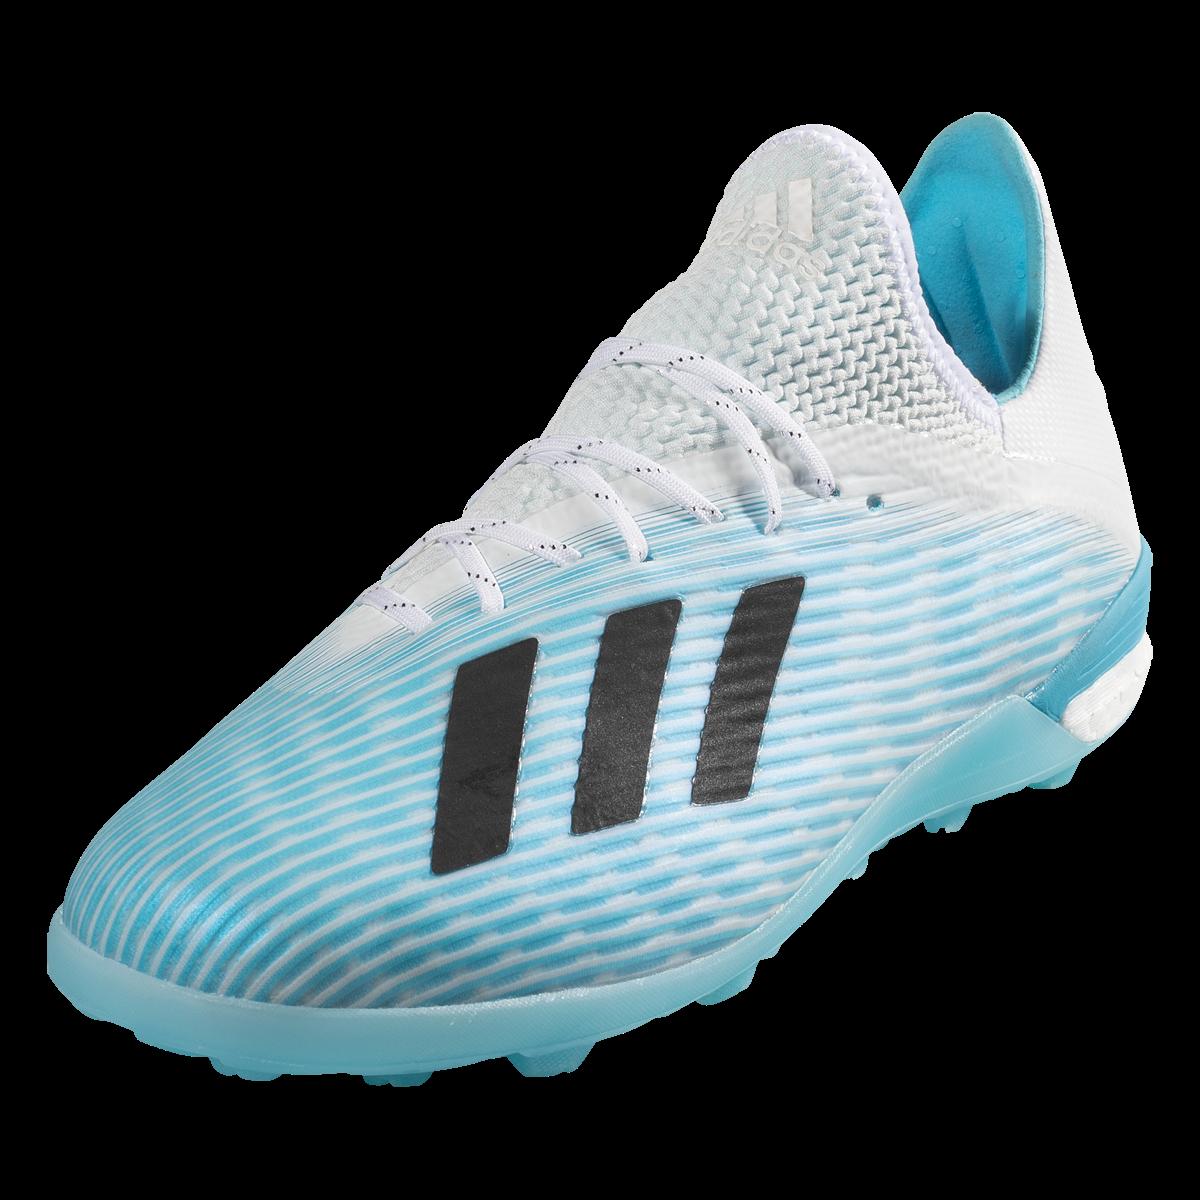 adidas X 19.1 TF Artificial Turf Soccer